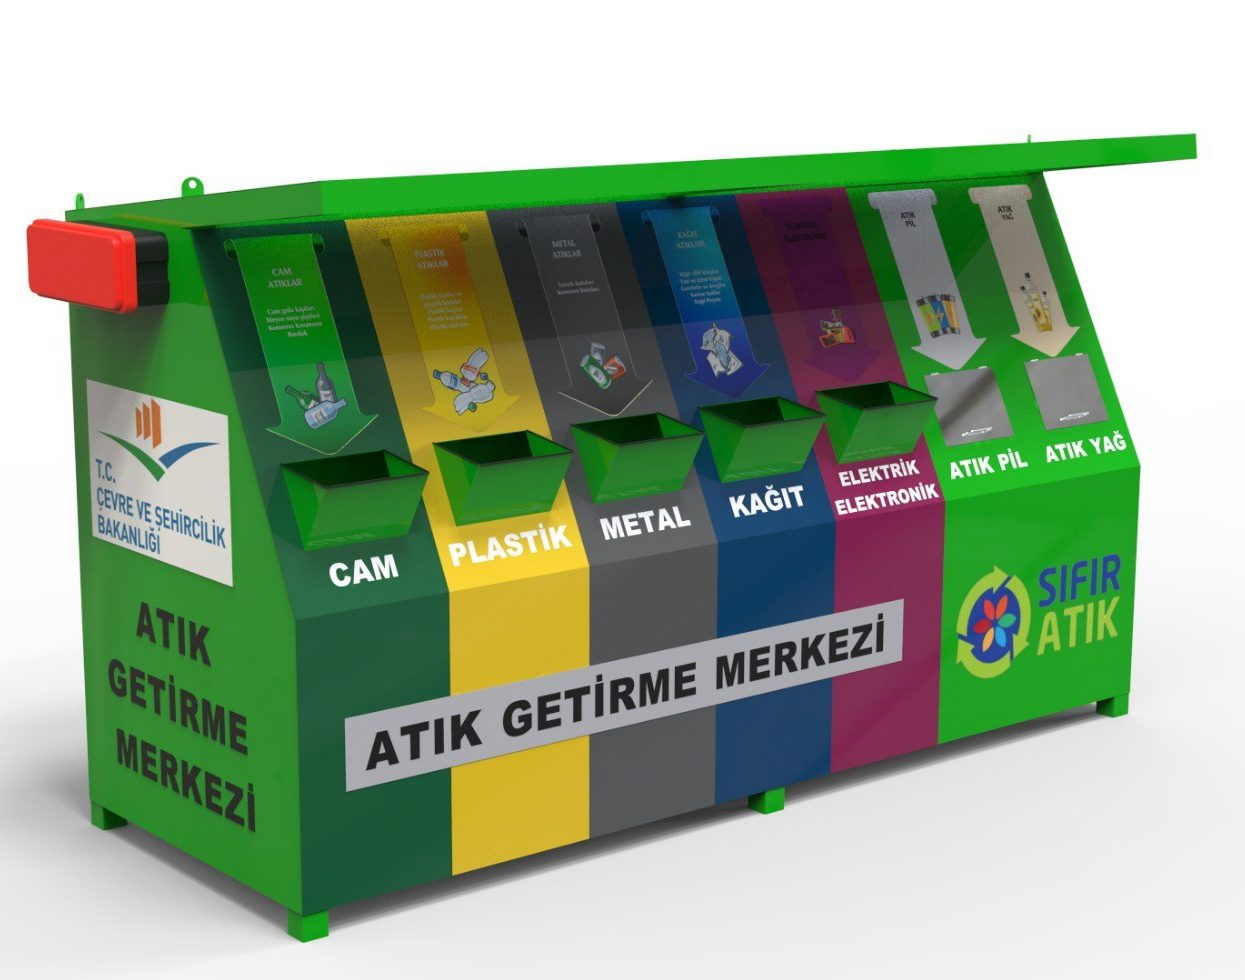 mobil-atik-getirme-merkezi